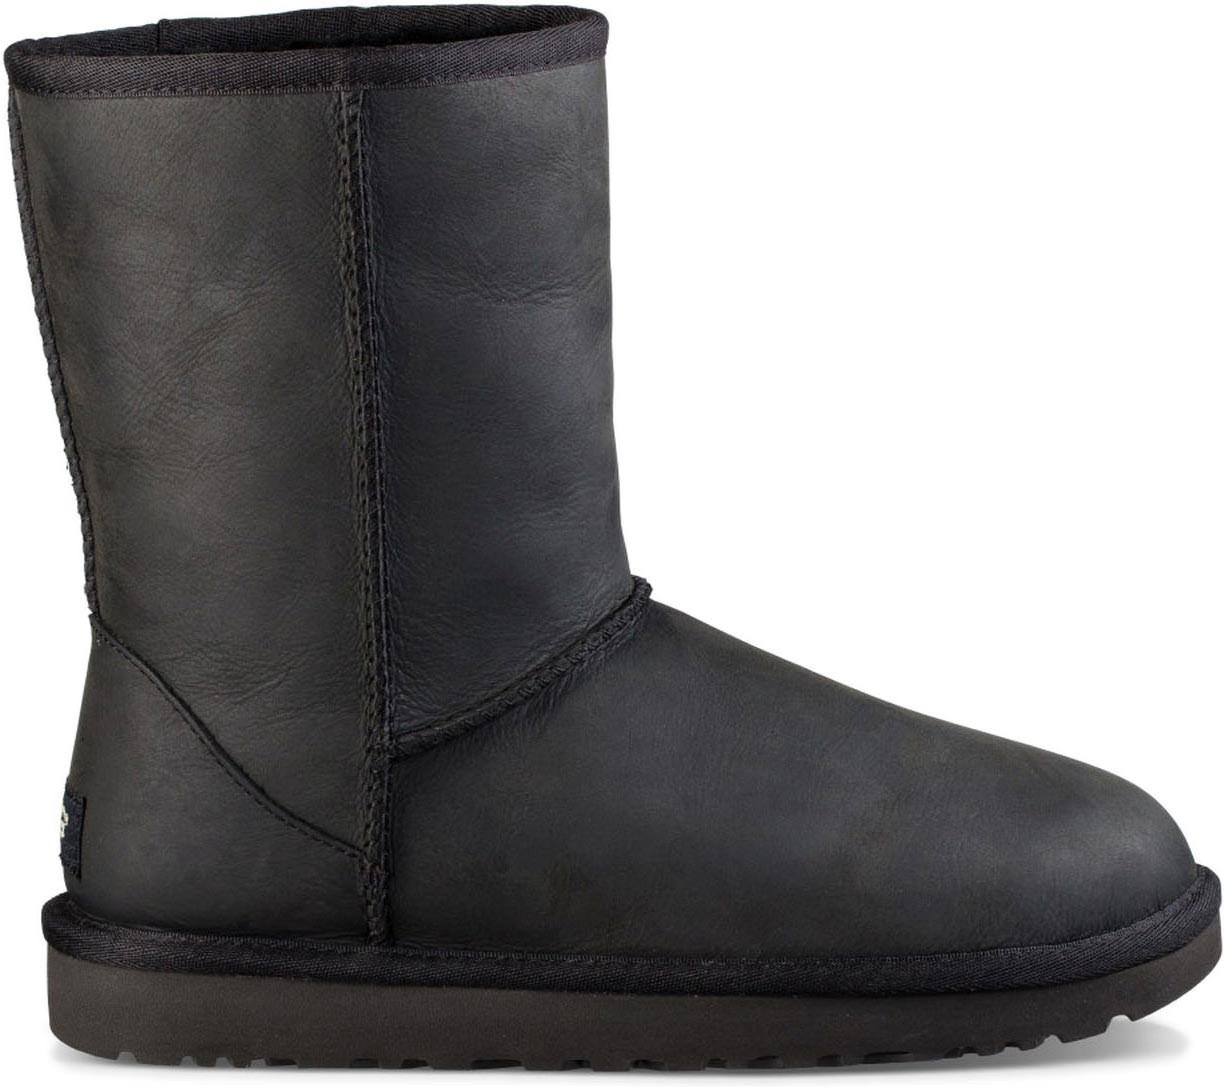 6c87042f1d05 ... Boots  UGG Women s Classic Short Leather. Black. Black  Black TL   Brownstone ...